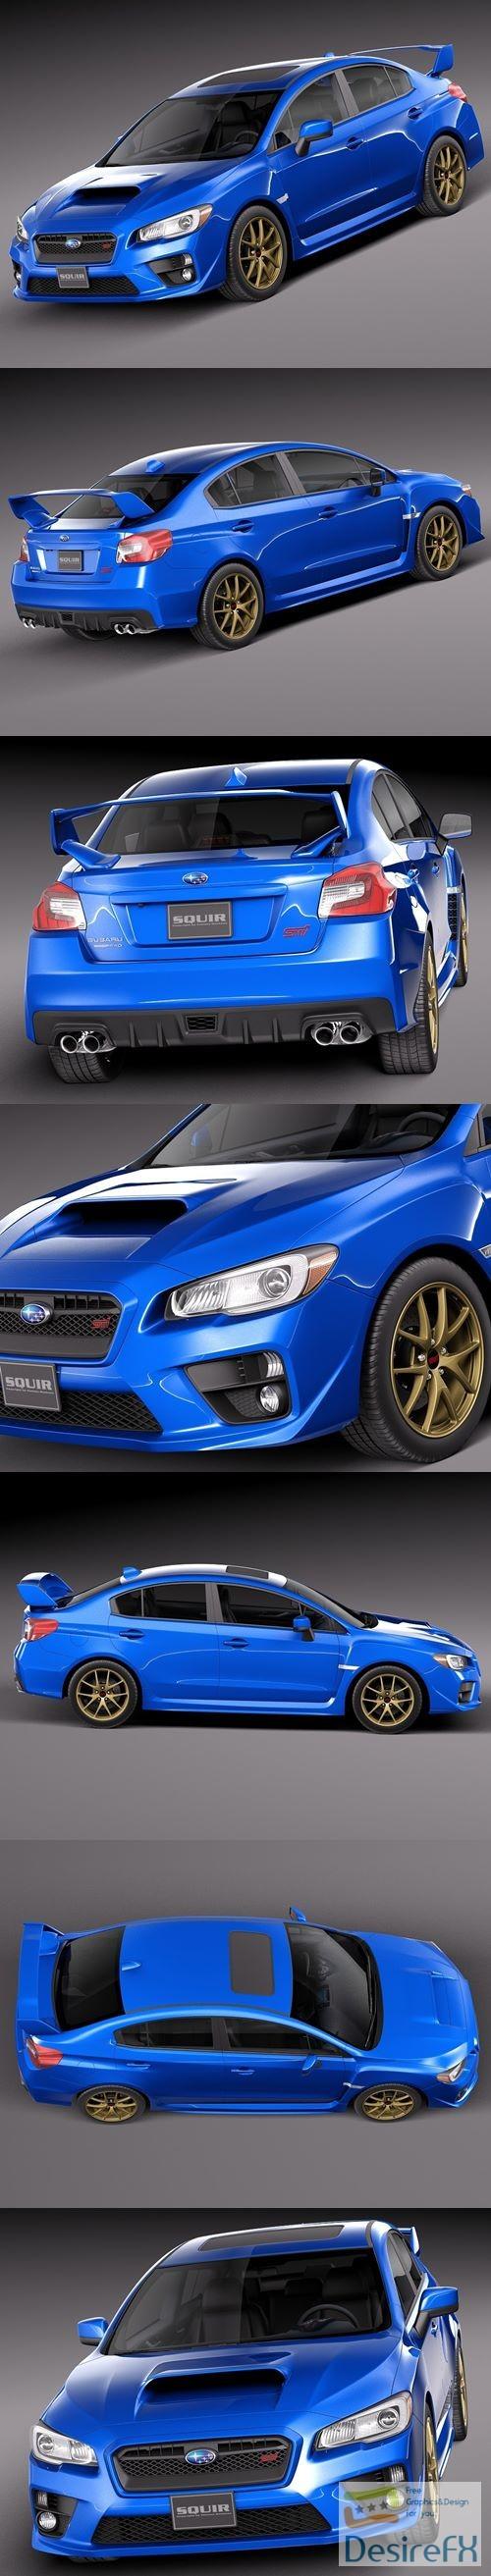 3d-models - Subaru Impreza WRX STI 2015 3D Model